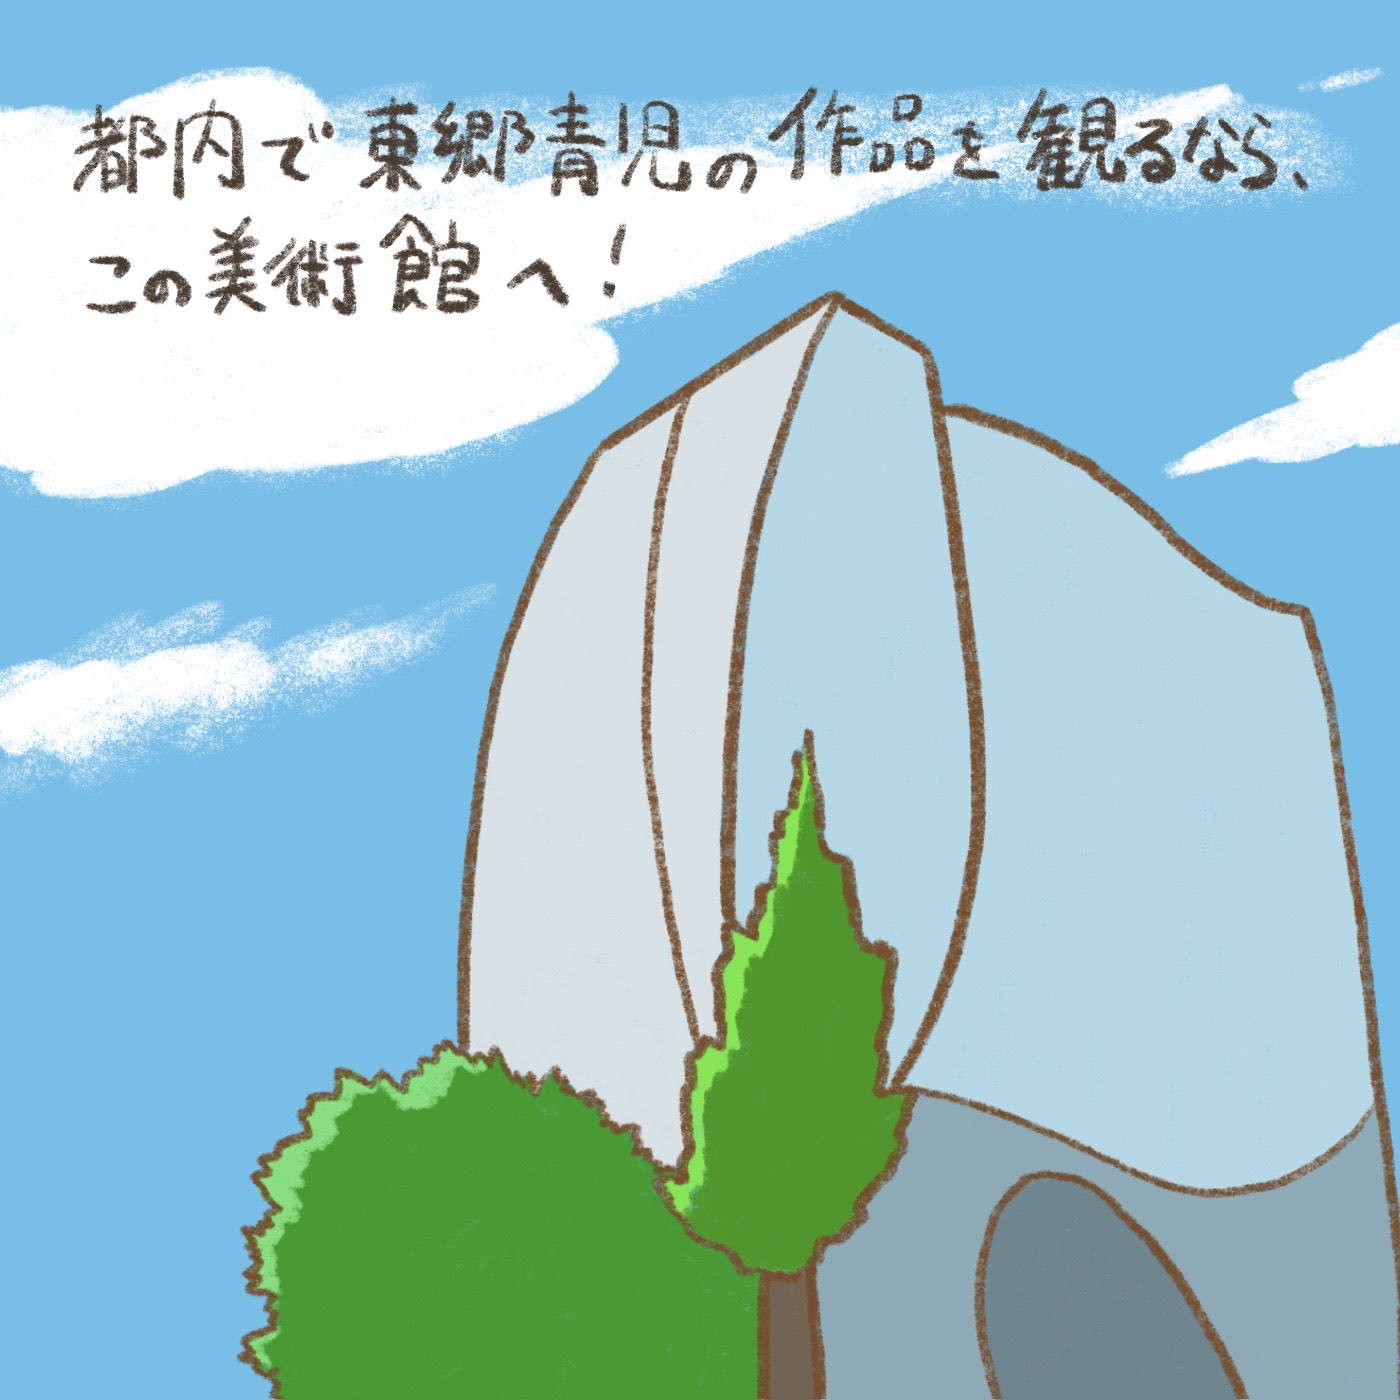 OBIKAKE ナニソレ 東郷青児 SOMPO美術館 新宿区